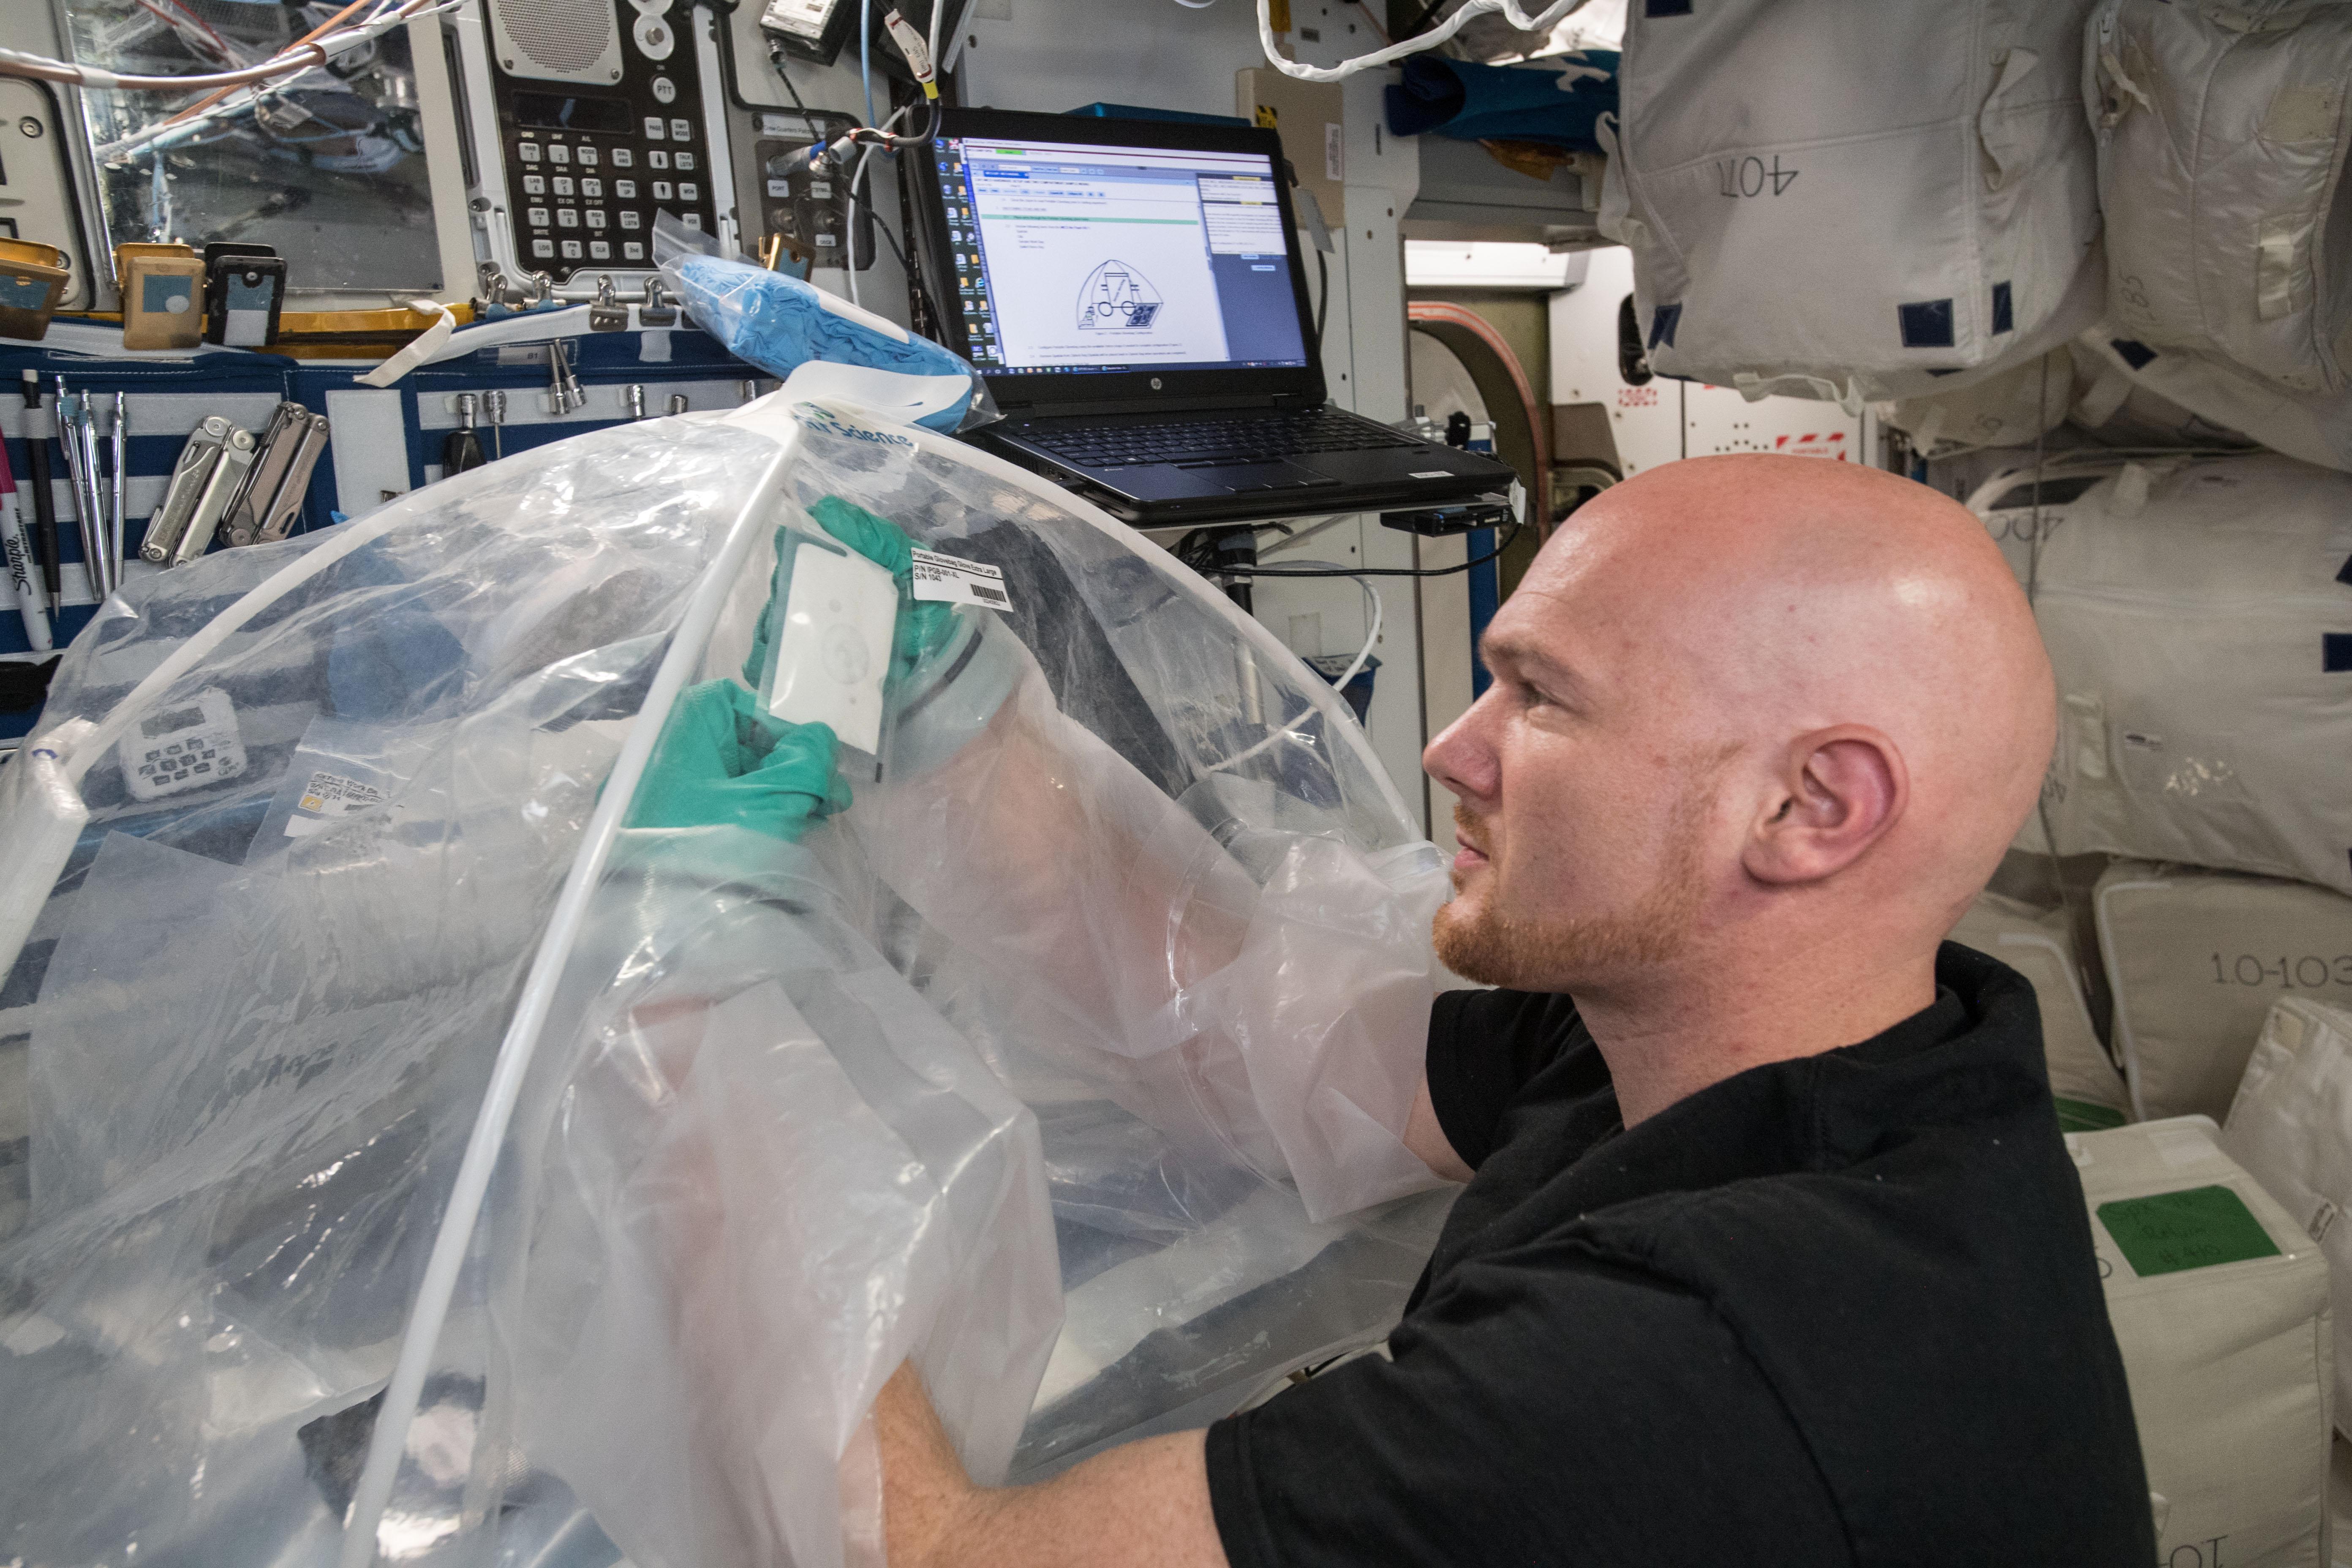 NASA experiments on seals in zero gravity